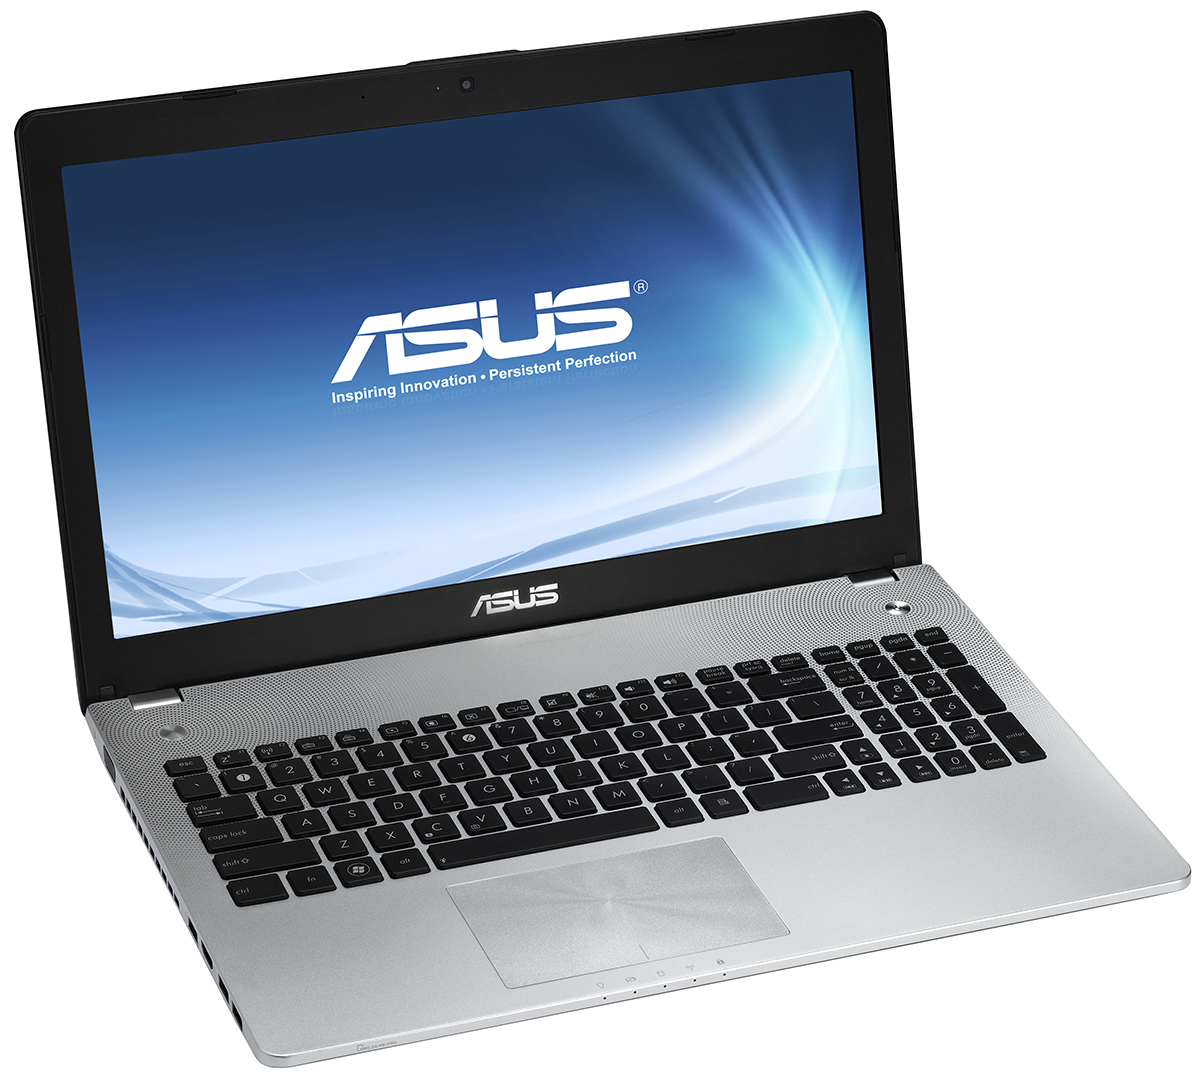 ASUS N56V: laptop specifications 40